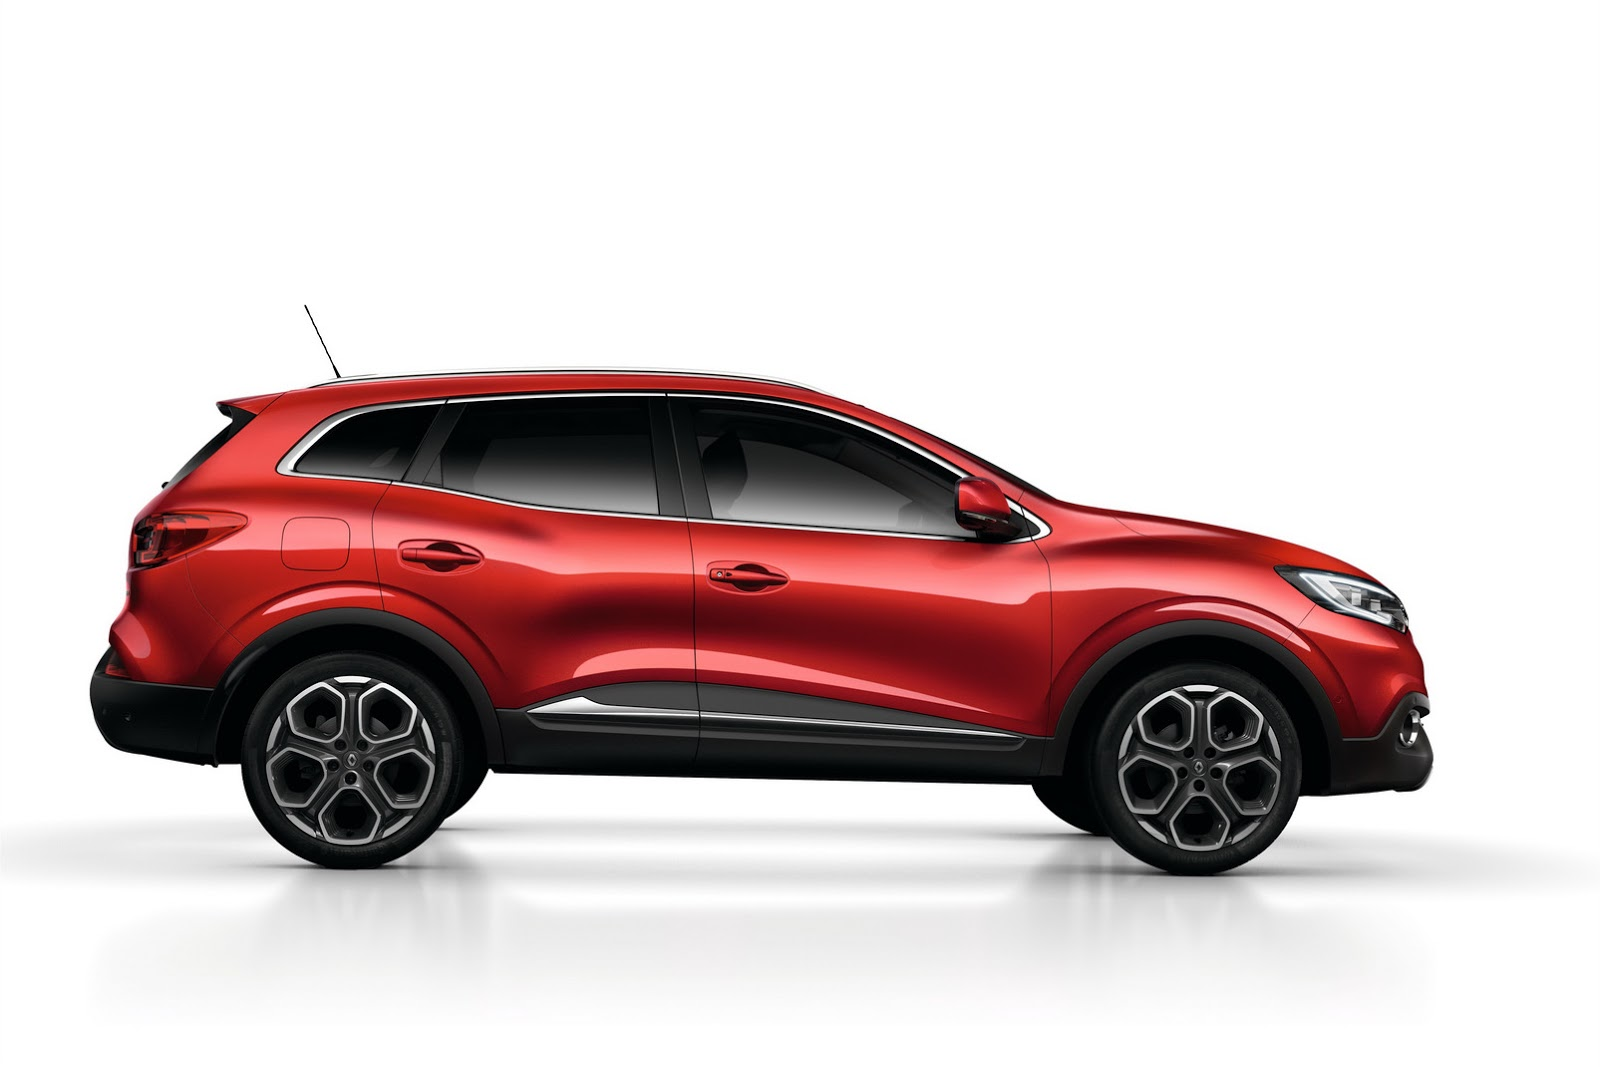 All New Renault Kadjar Suv Officially Revealed Pics Video